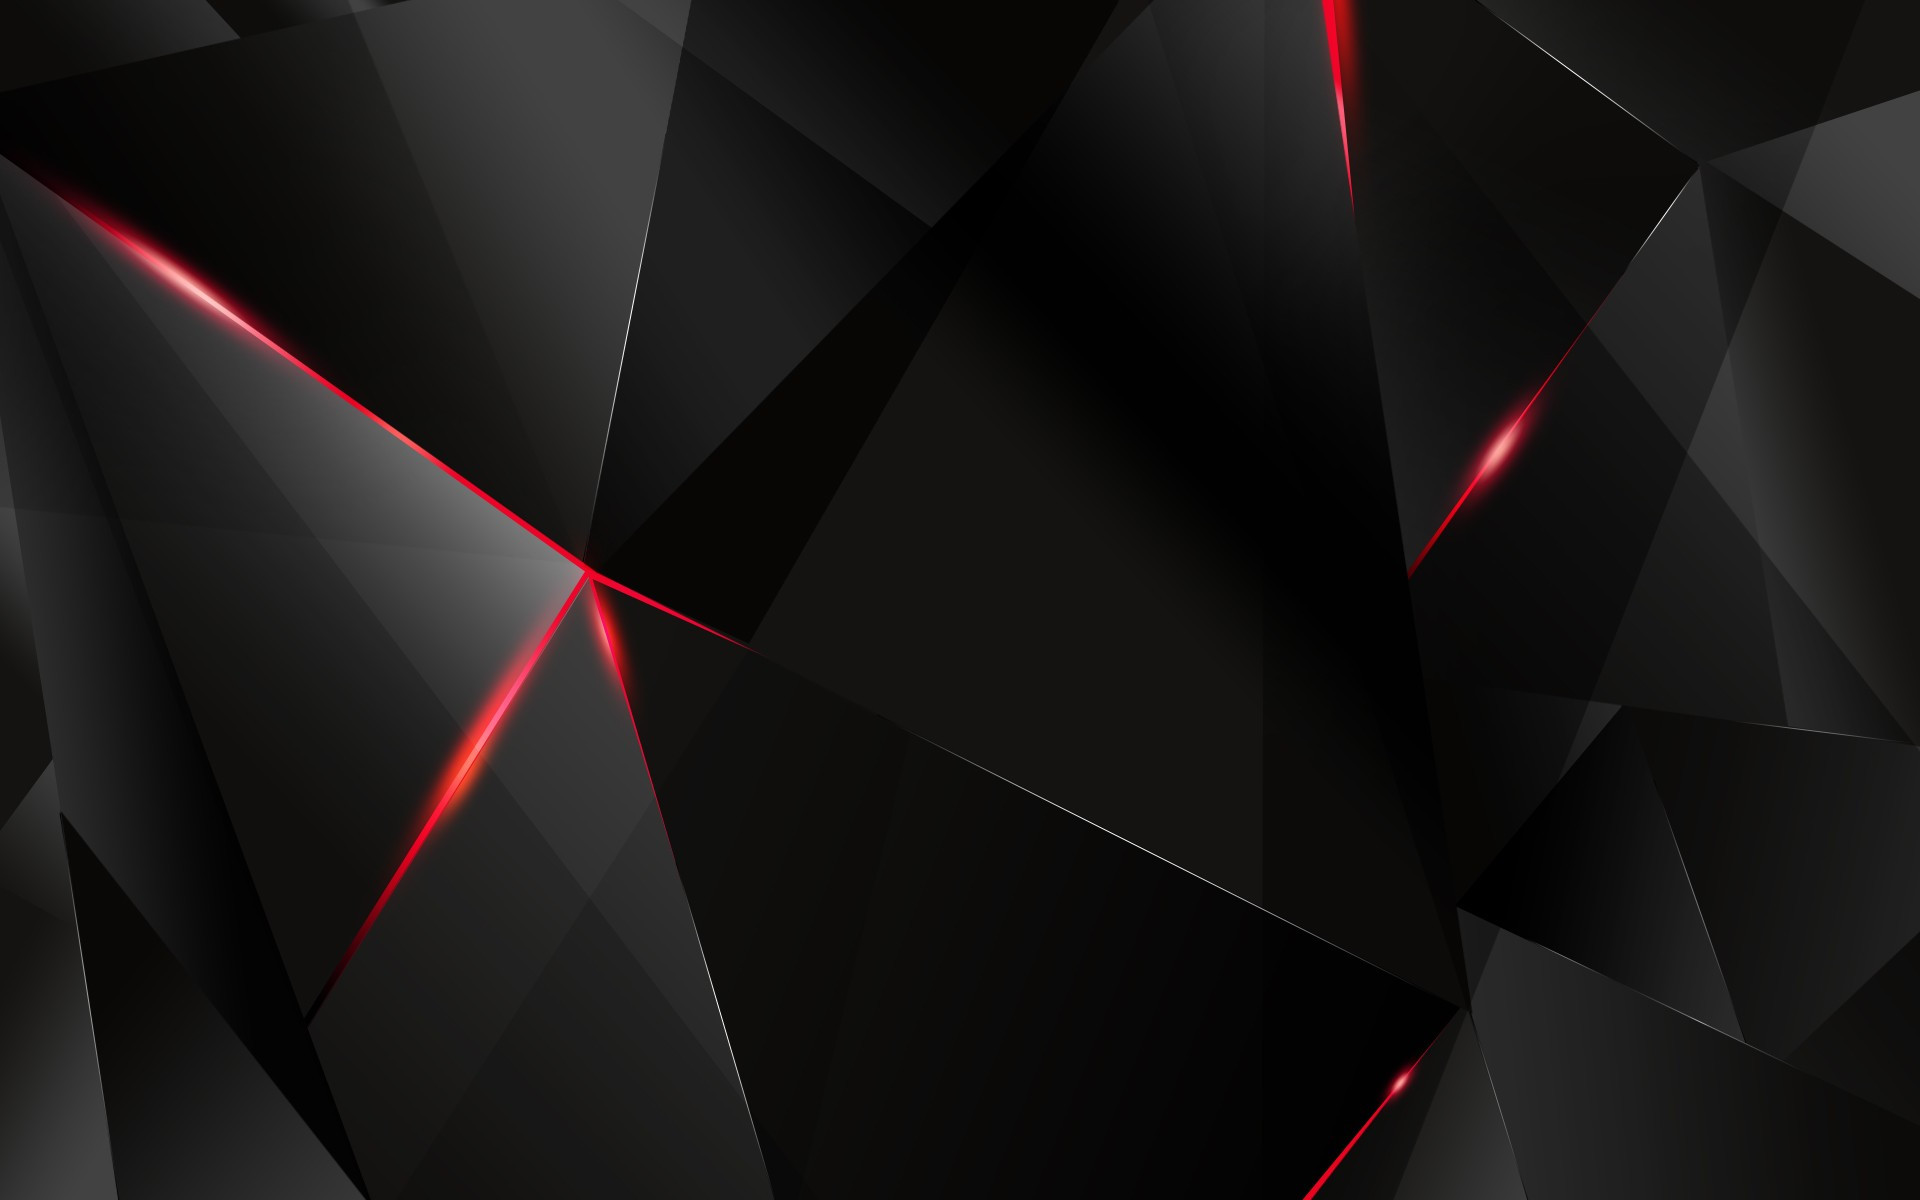 ws_Abstract_Dark_Geometry_1920x1200.jpg